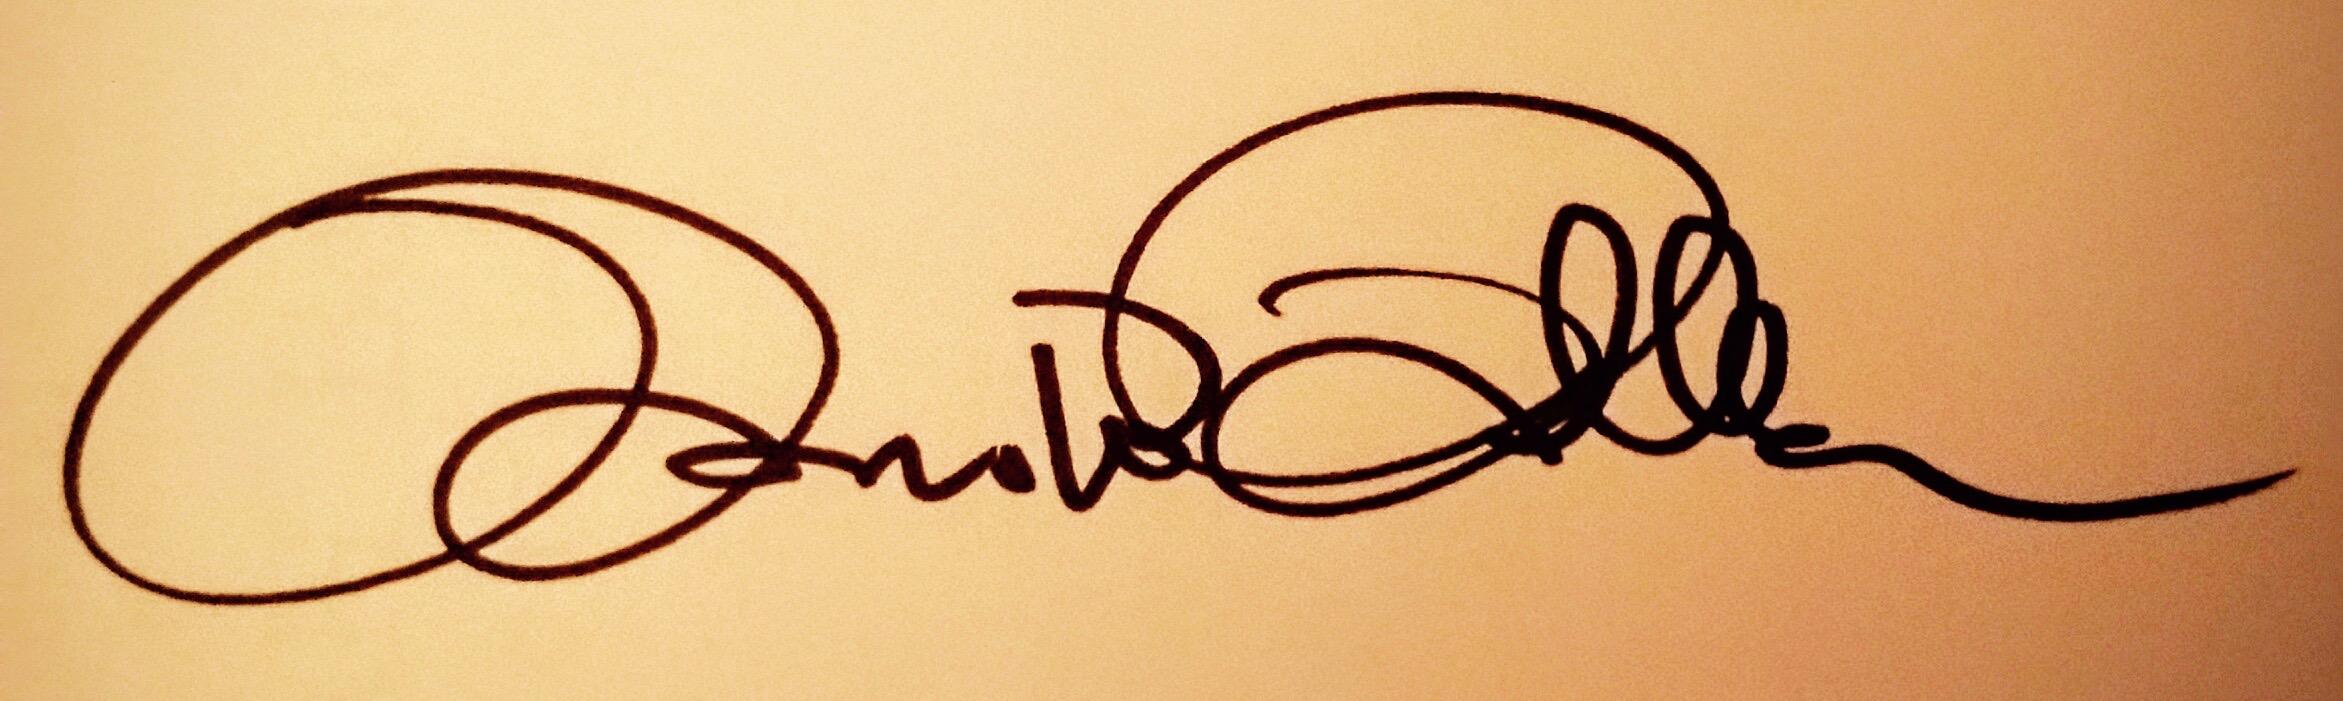 Leonardo Lanzolla's Signature